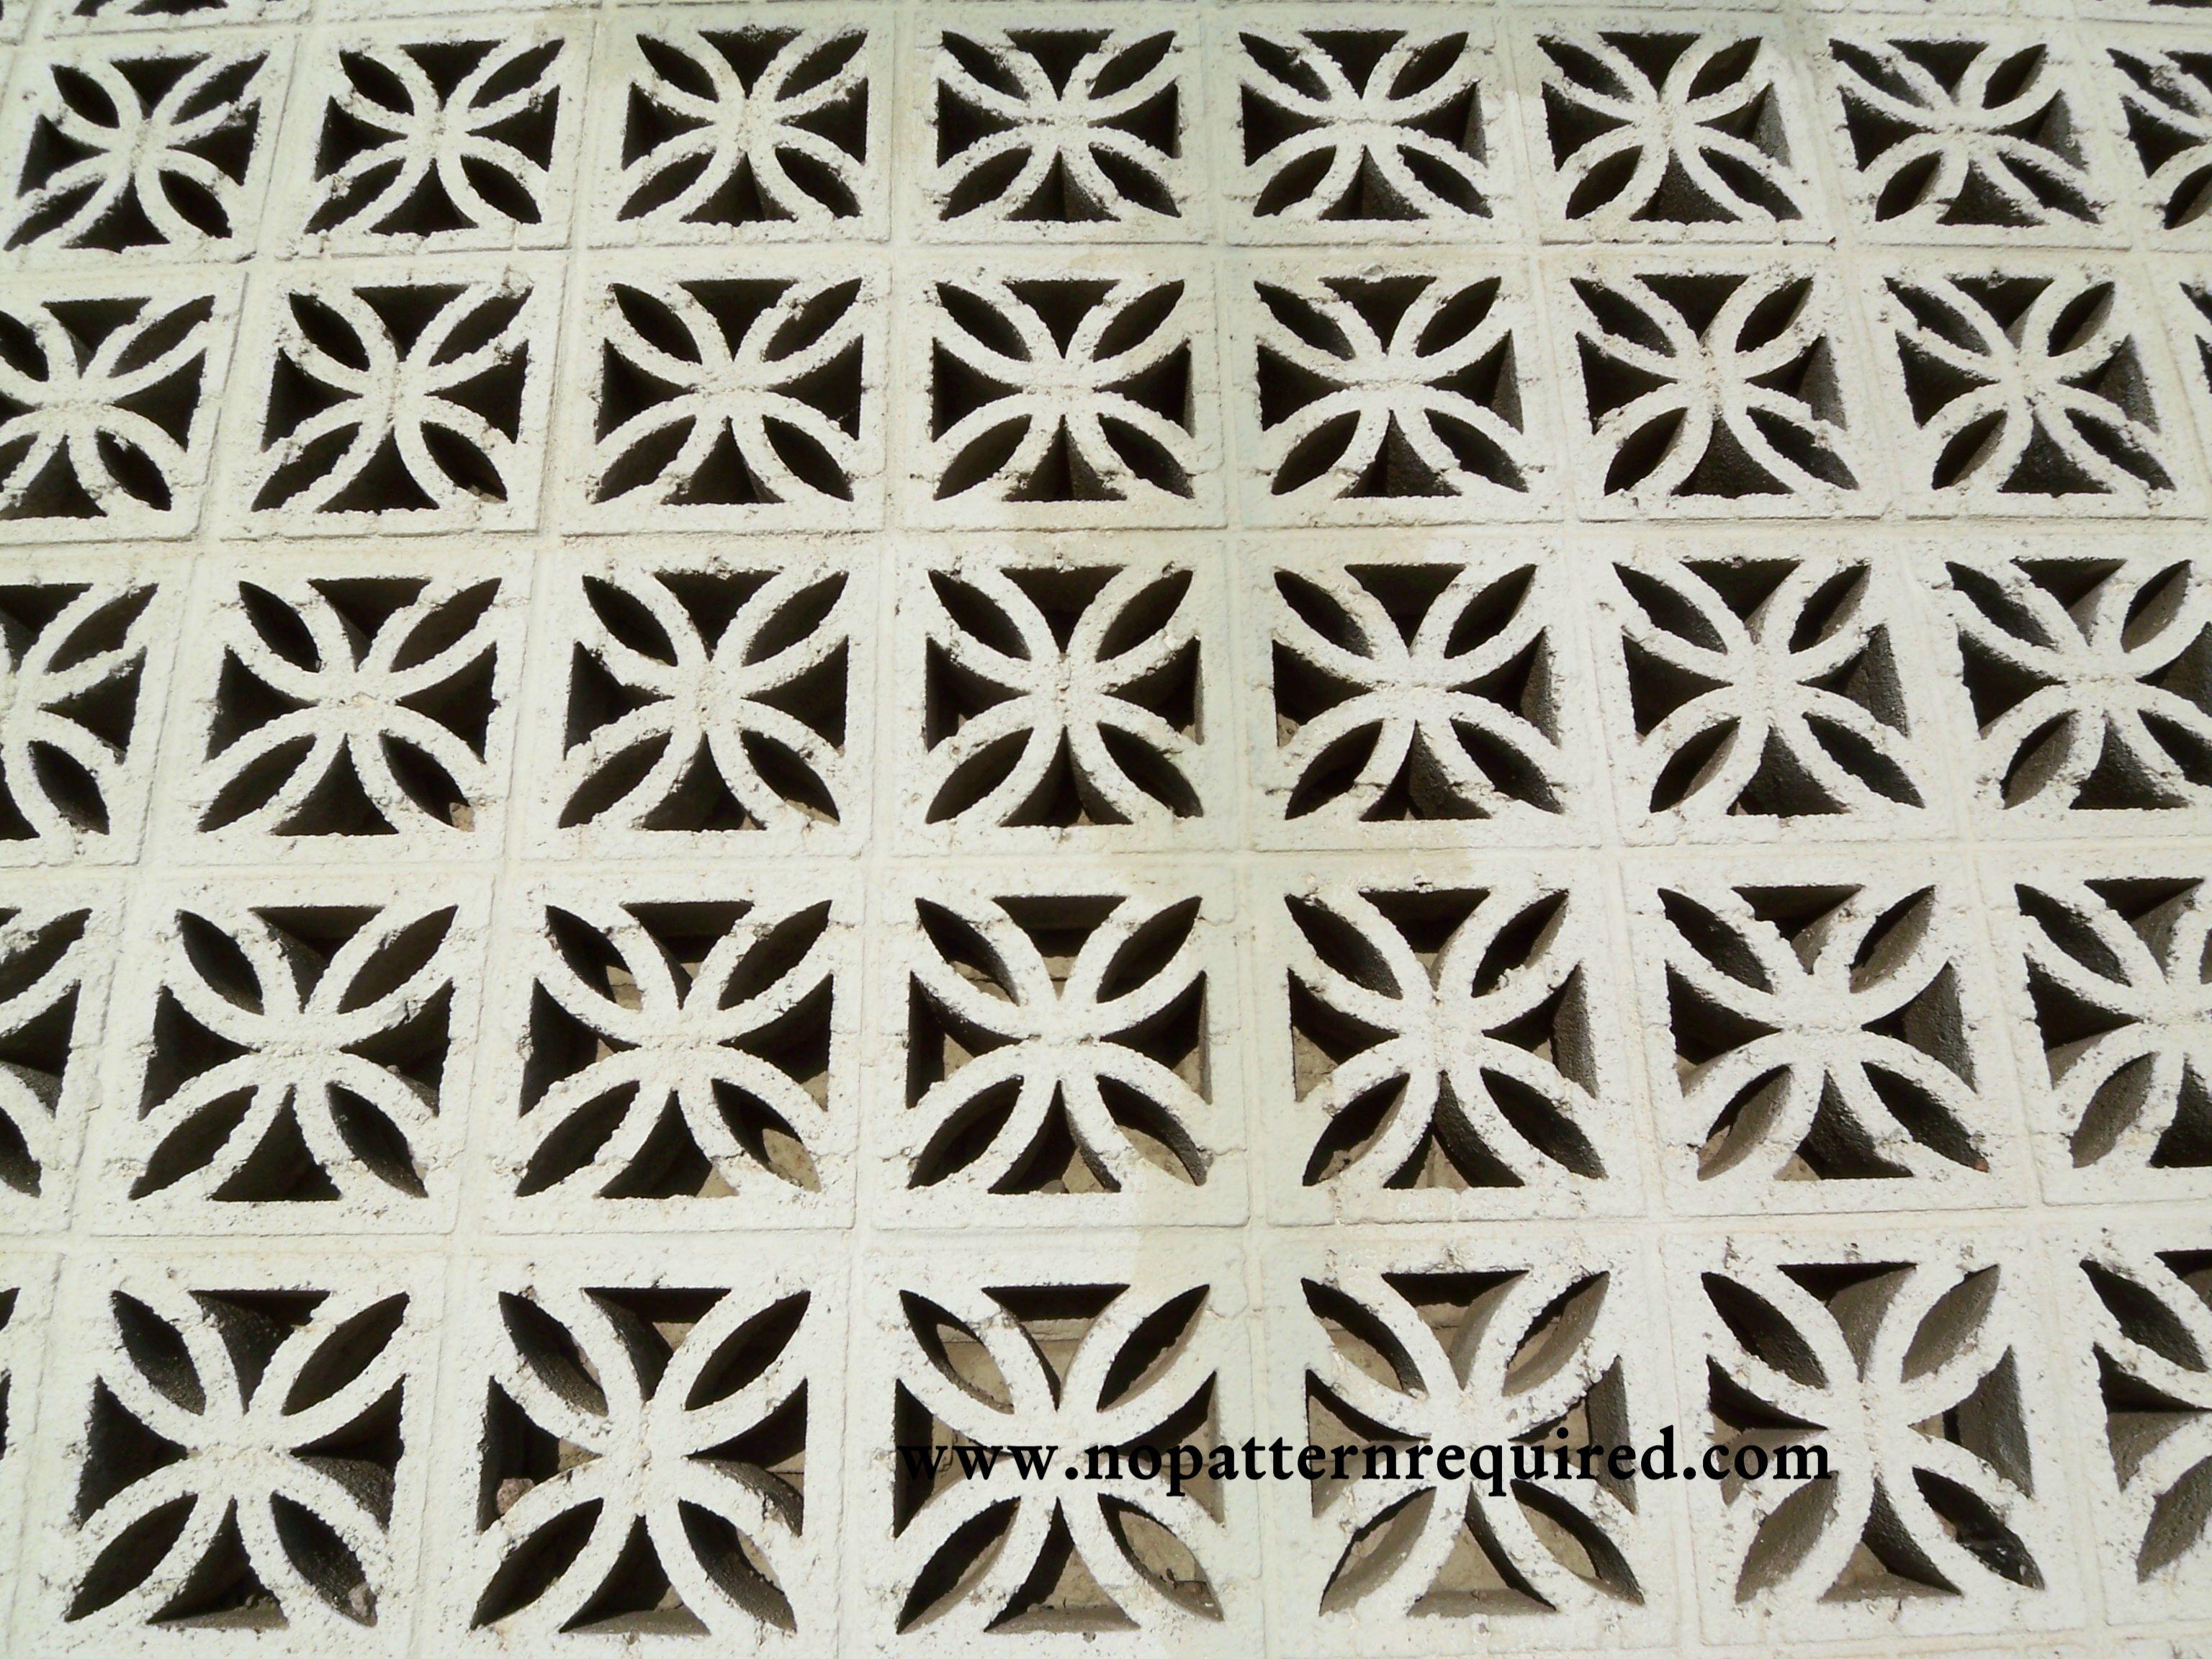 Decorative Concrete Screen Block Part 2 Screen Block Concrete